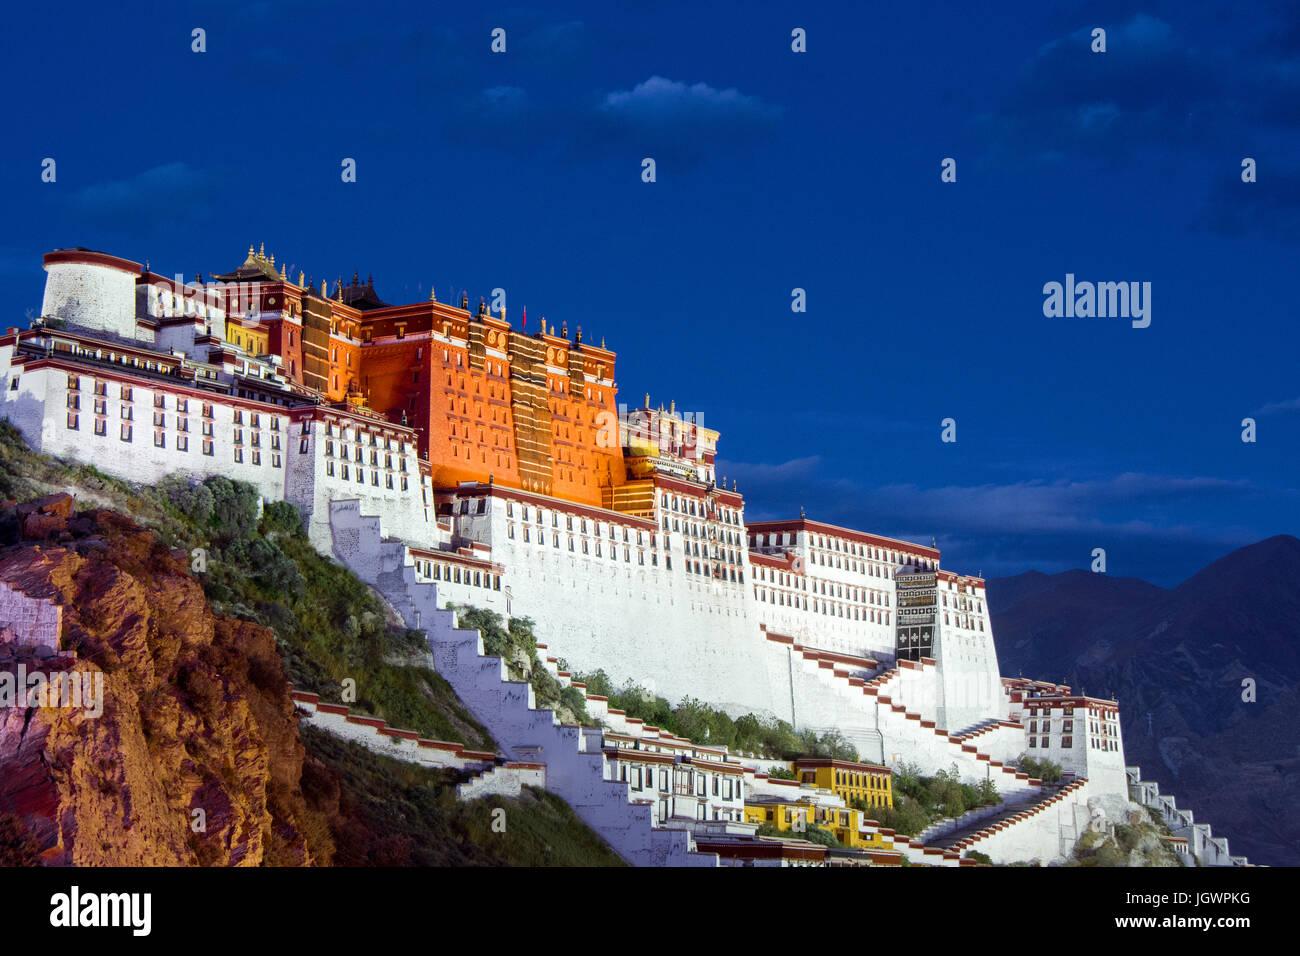 Potala palace,Tibet,China - Stock Image